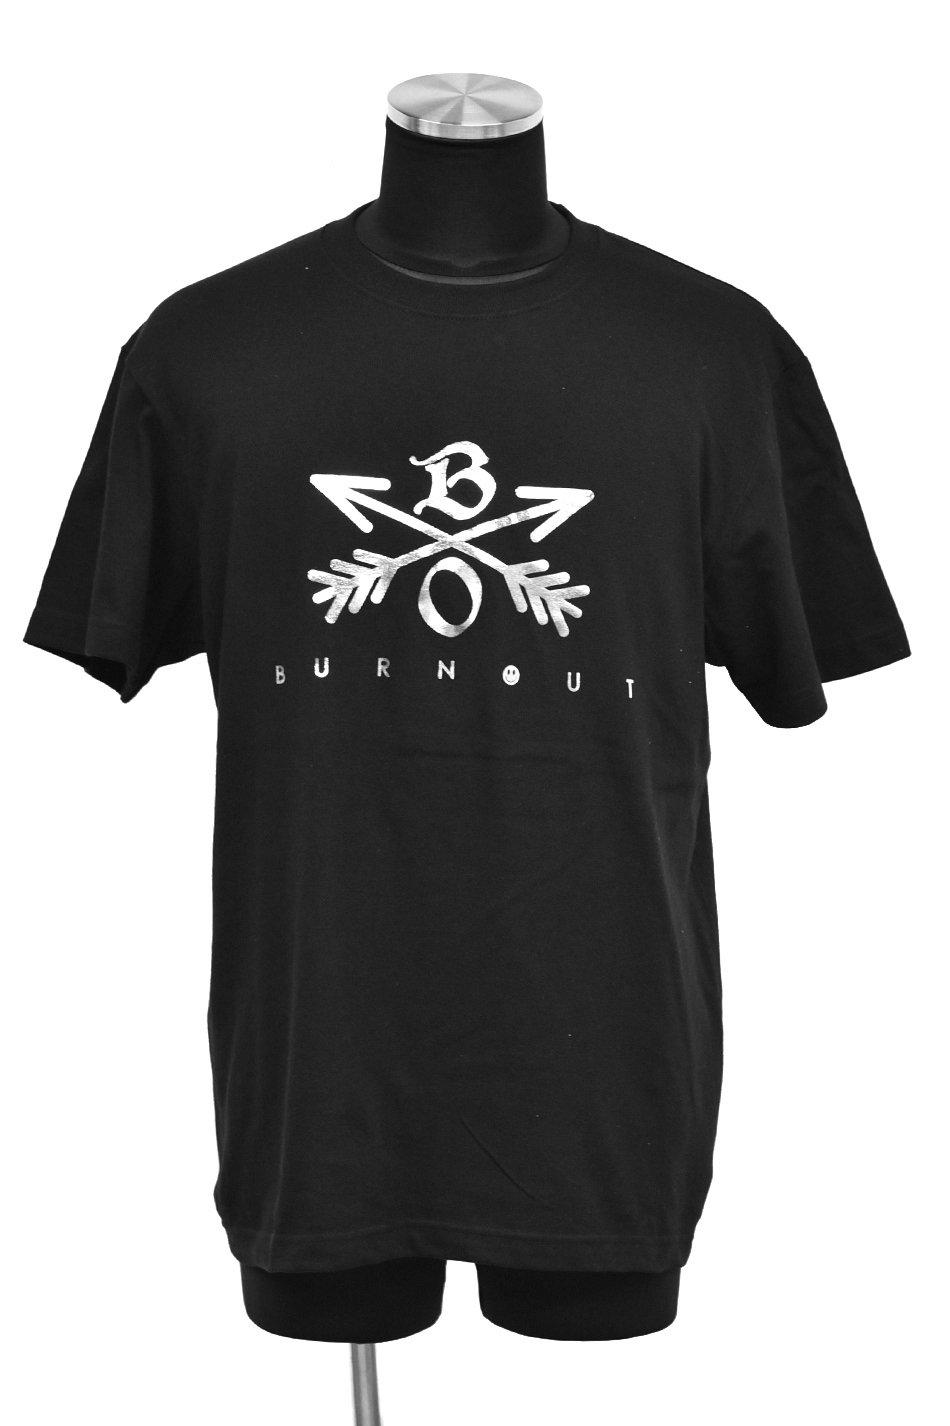 Burnout(バーンアウト) Crossed Arrows T-Shirt 2019 / ブラック×銀箔